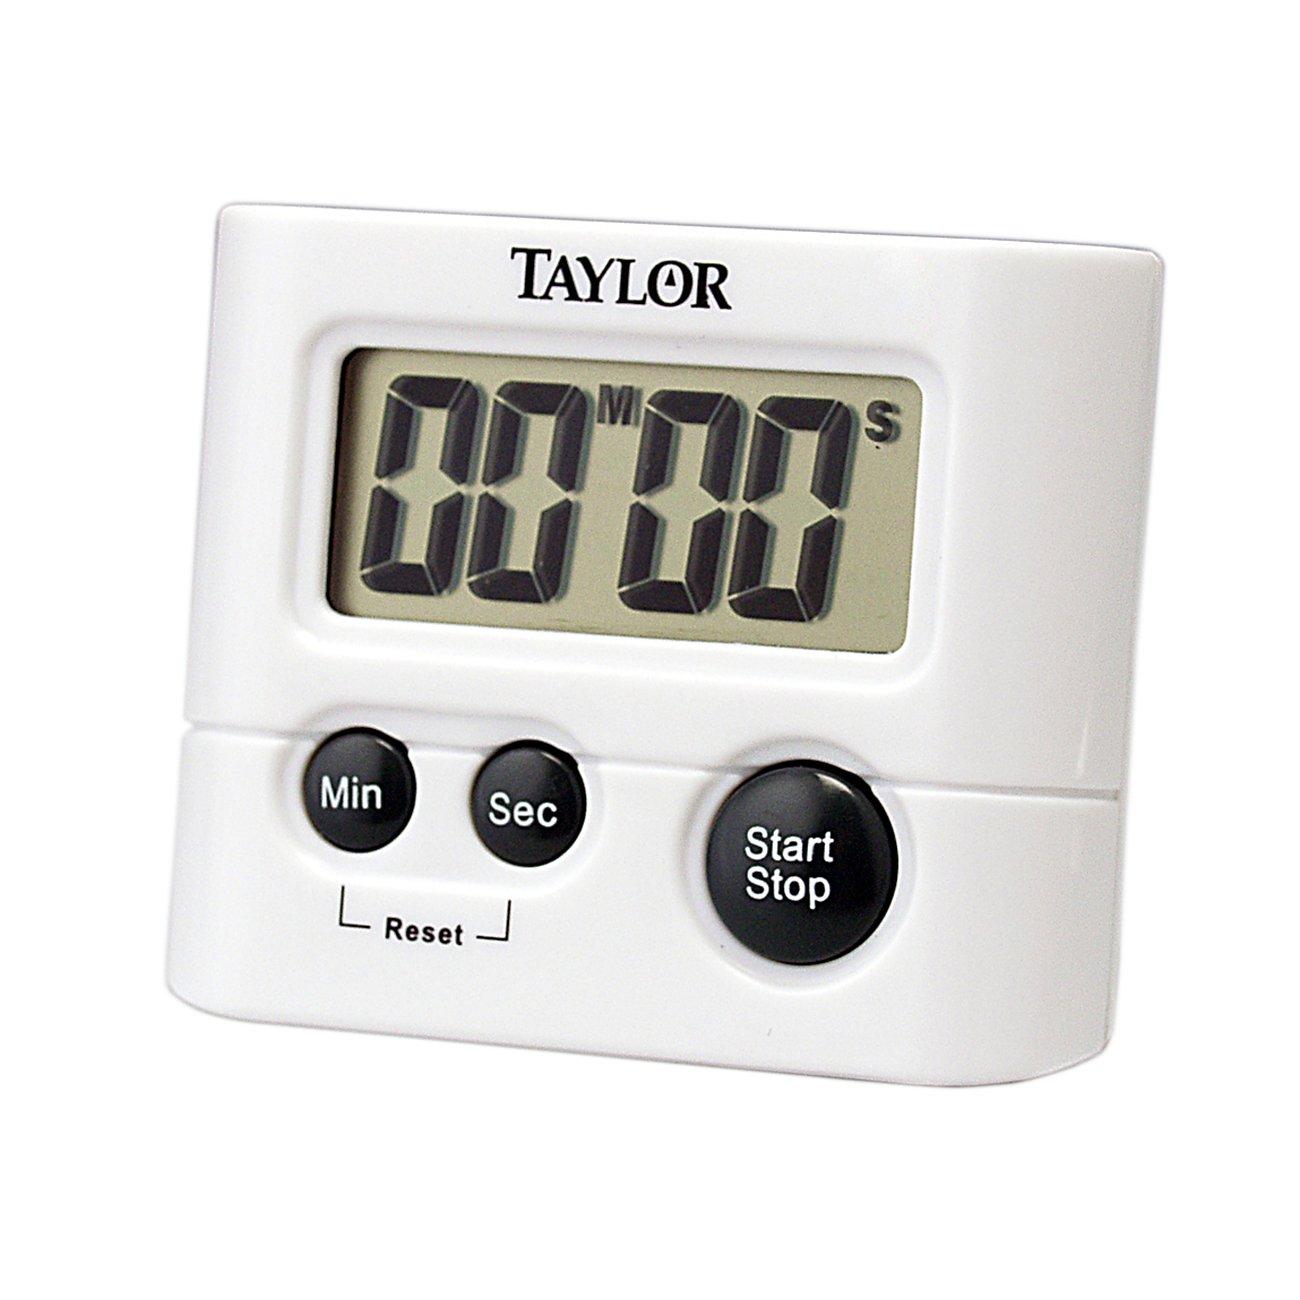 Taylor 5827-21 Digital Kitchen Timer , New, Free Shipping